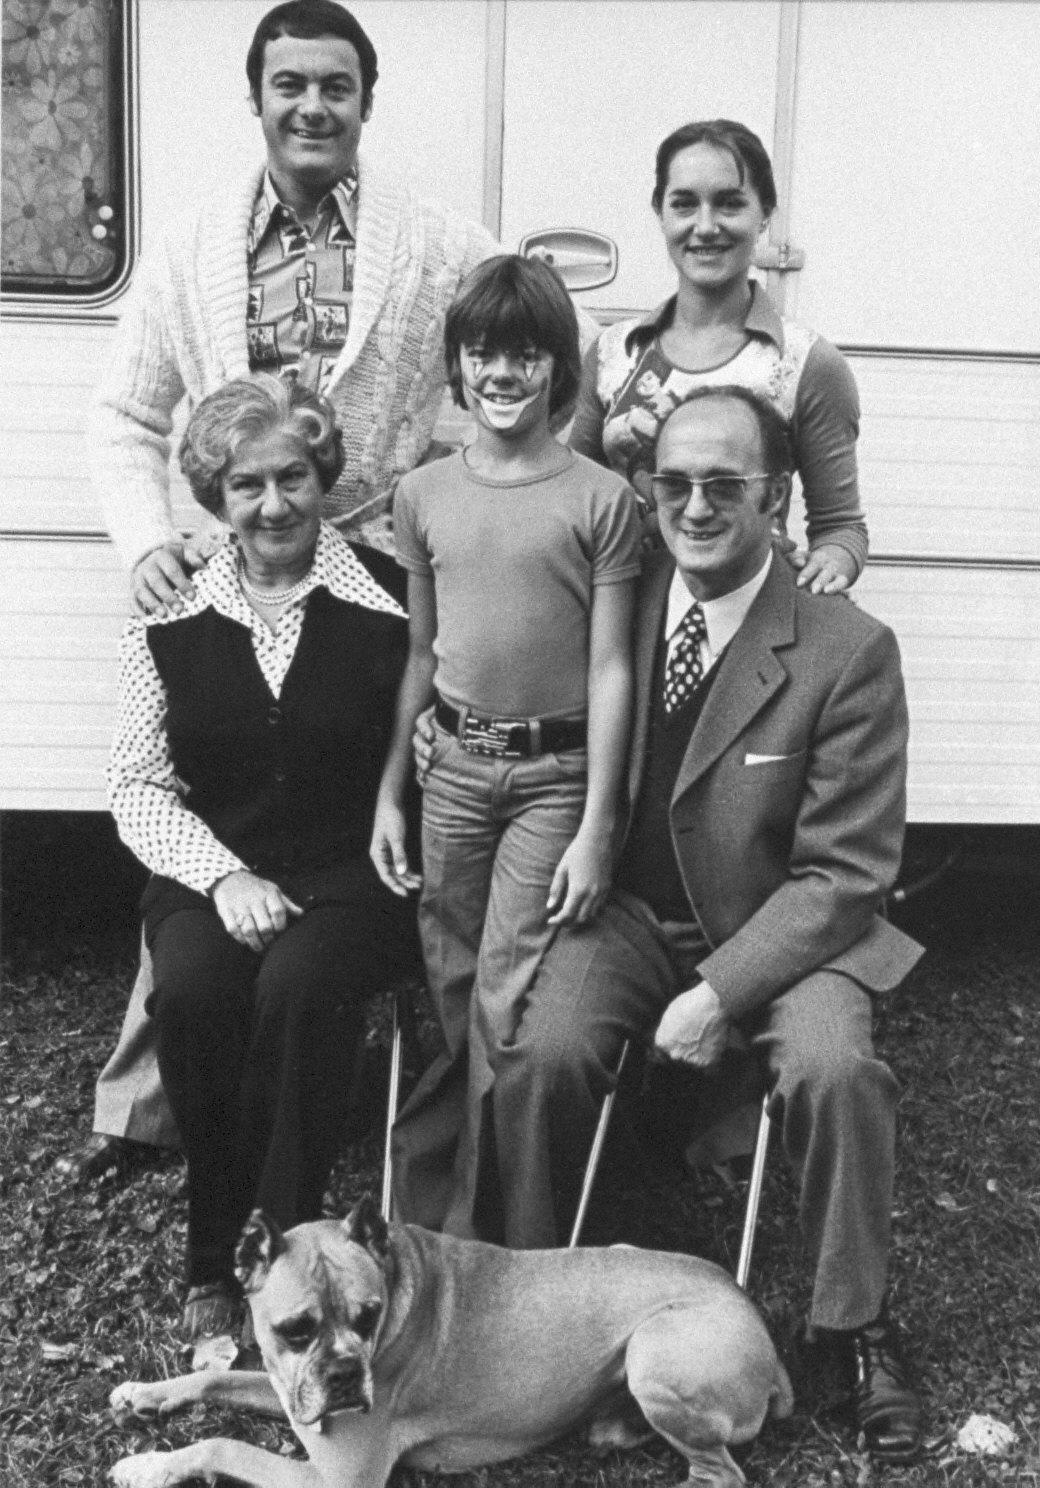 Circus Family Portrait-Circus Knie